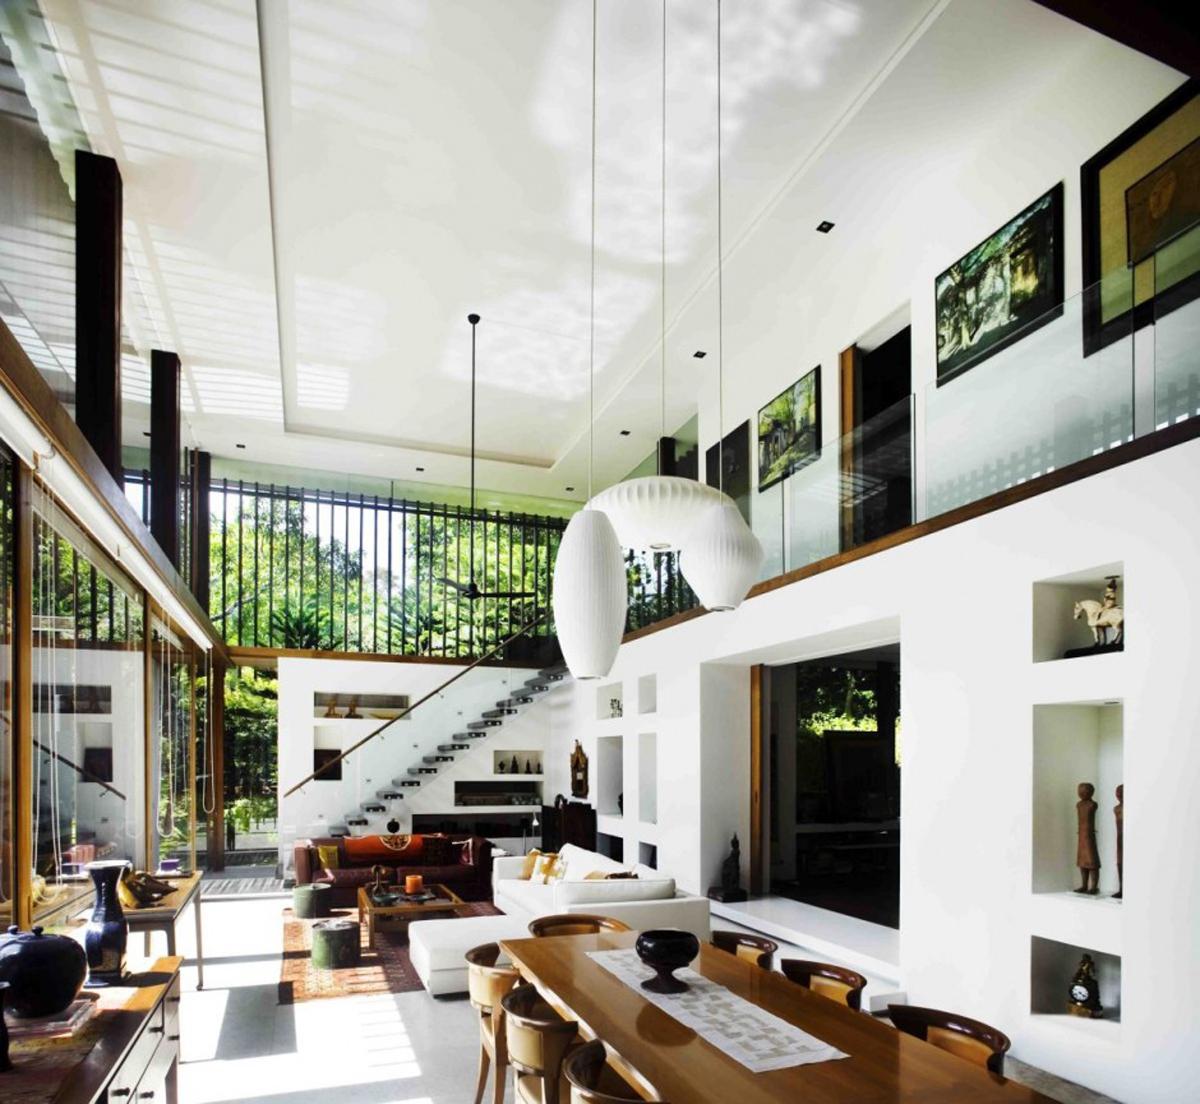 Cawah homes modern dream house design with wonderful garden views